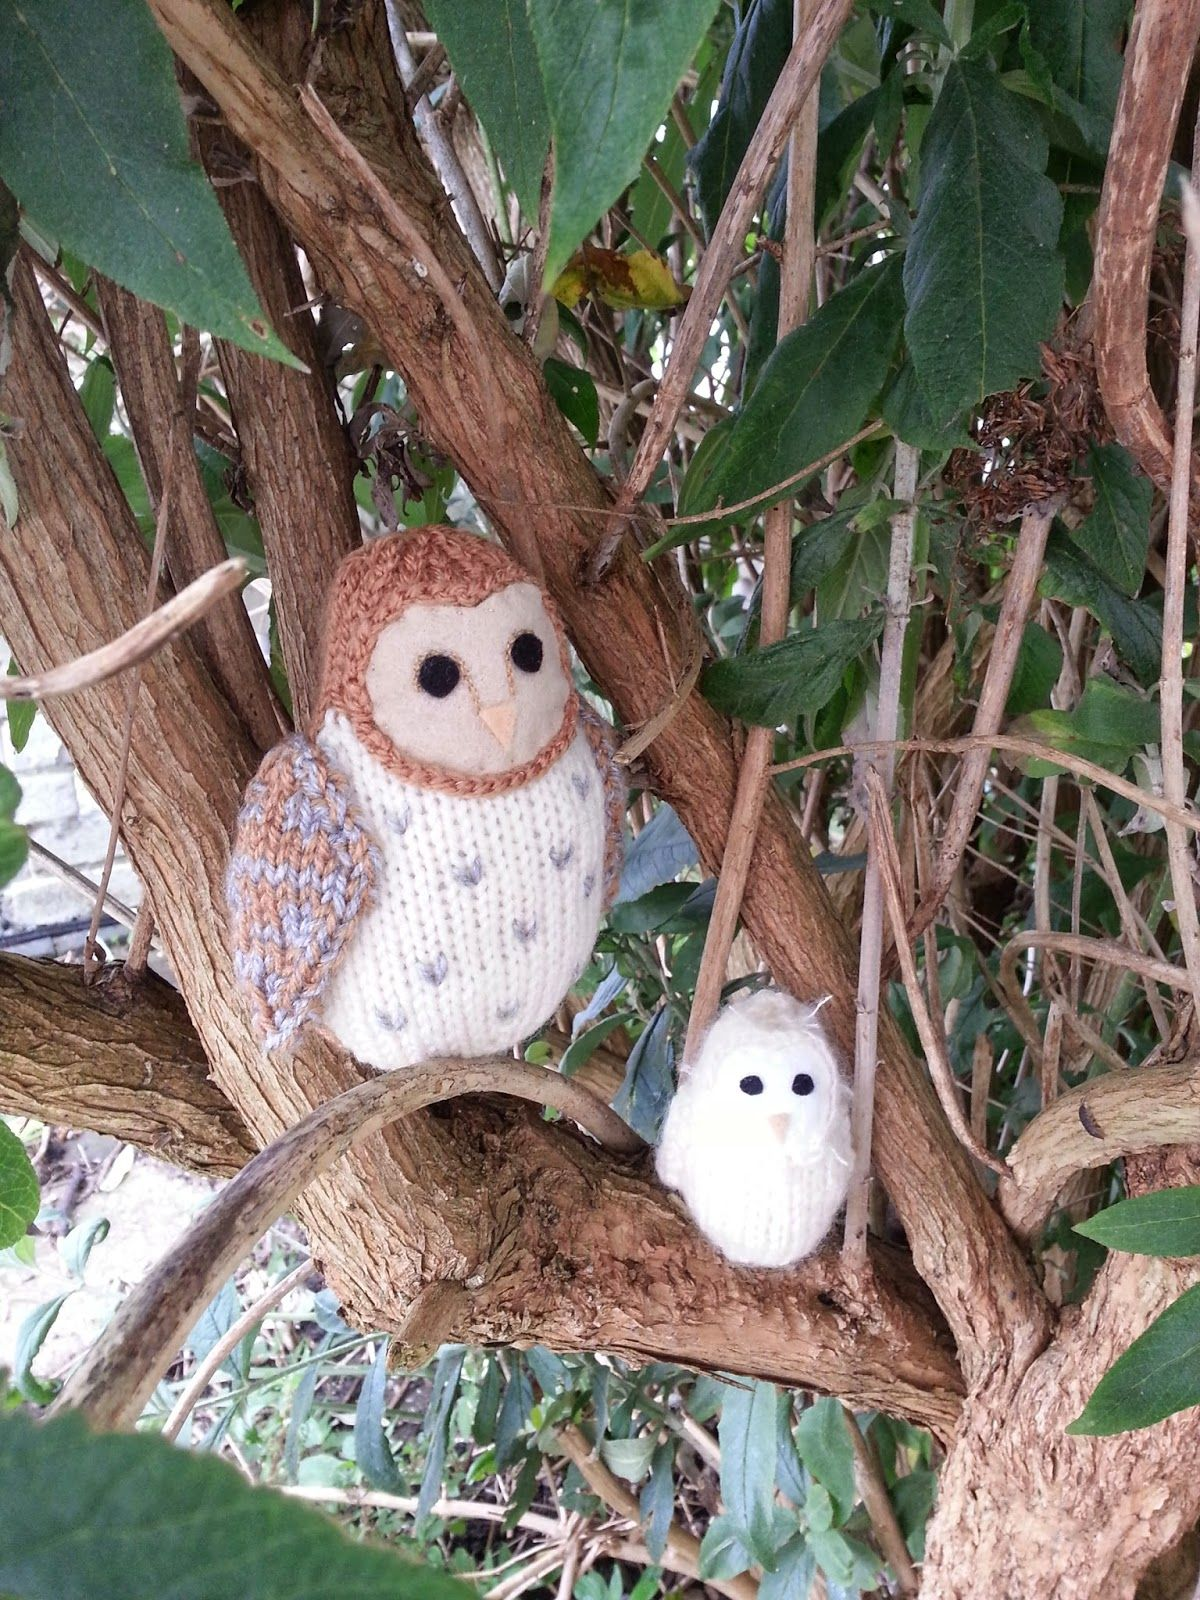 barn owl family, nestling in a tree | Too Cute! | Pinterest | Bird ...